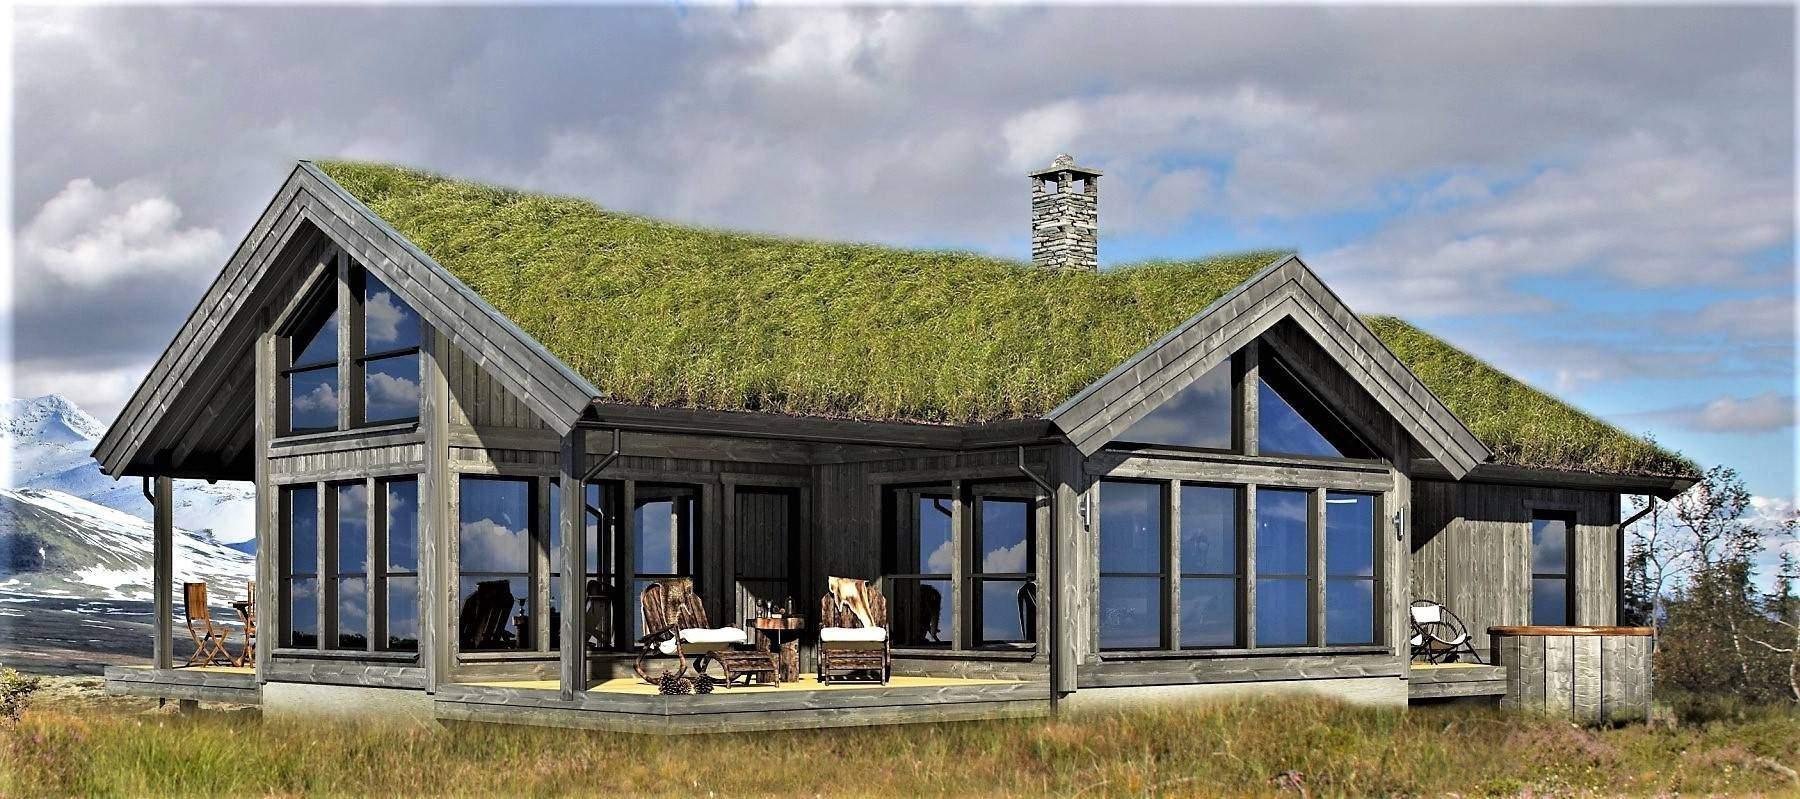 2500 Hytte Arkitektegnet Strynsfjell 120